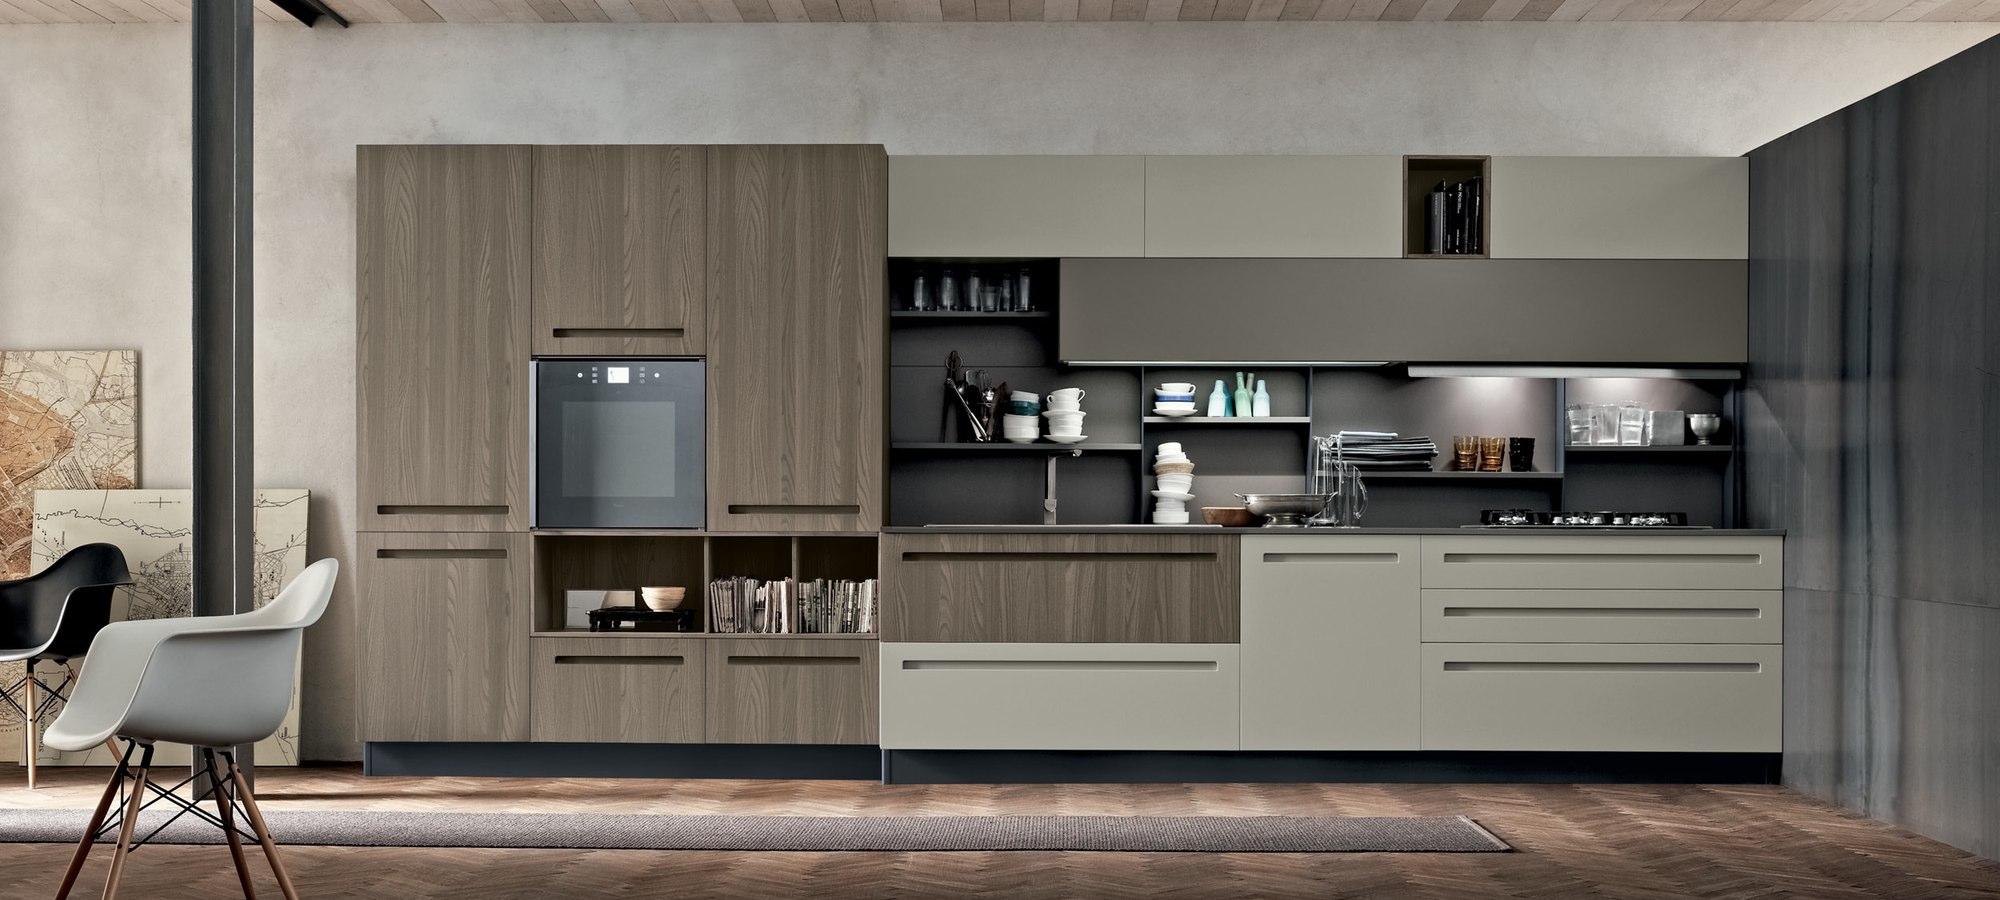 Emejing Composizioni Cucine Moderne Contemporary - Ideas & Design ...